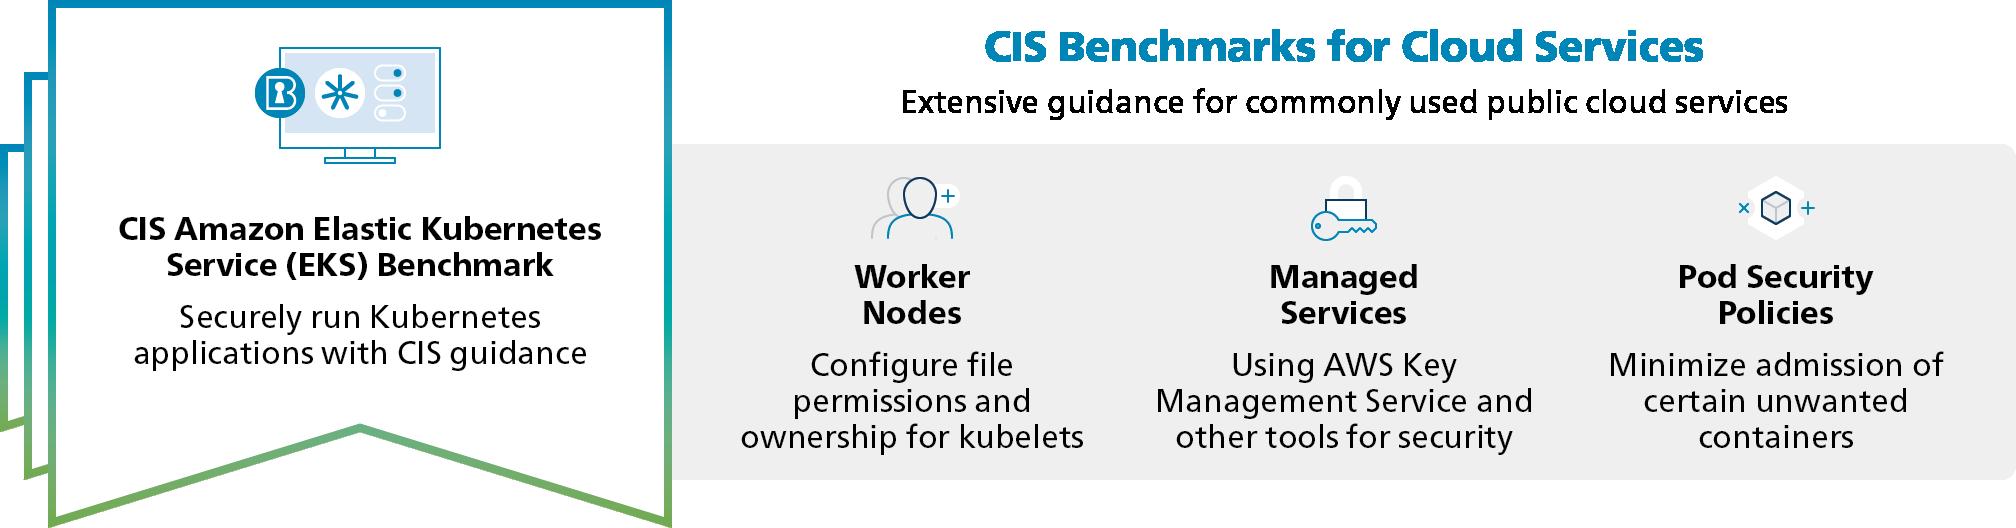 CIS-Amazon_Elastic_Kubernetes_Service_Benchmark-Cloud_Services.png